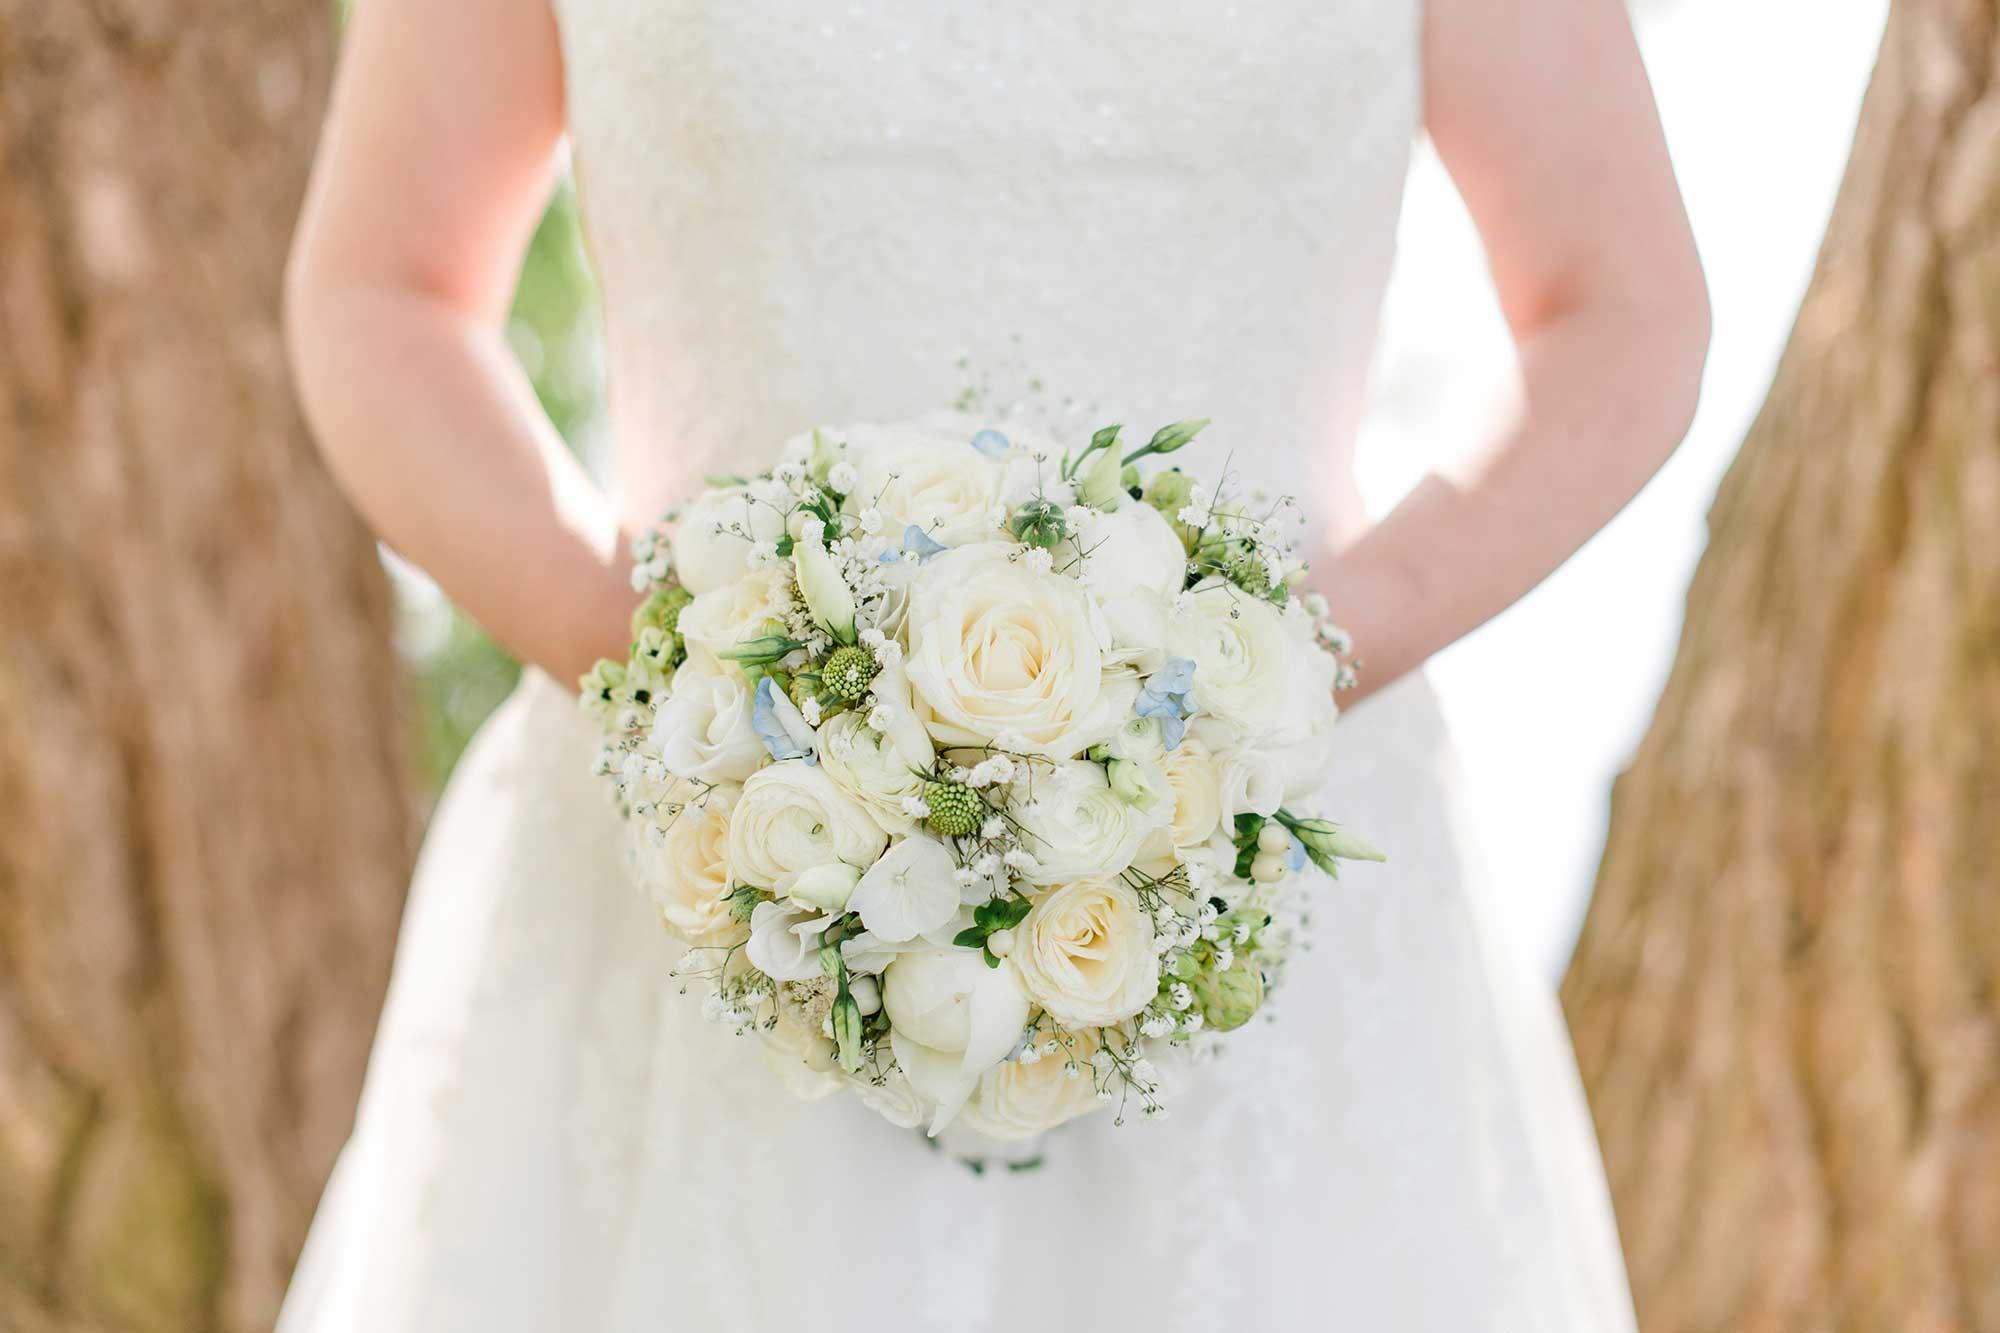 034-Brautpaarportraits